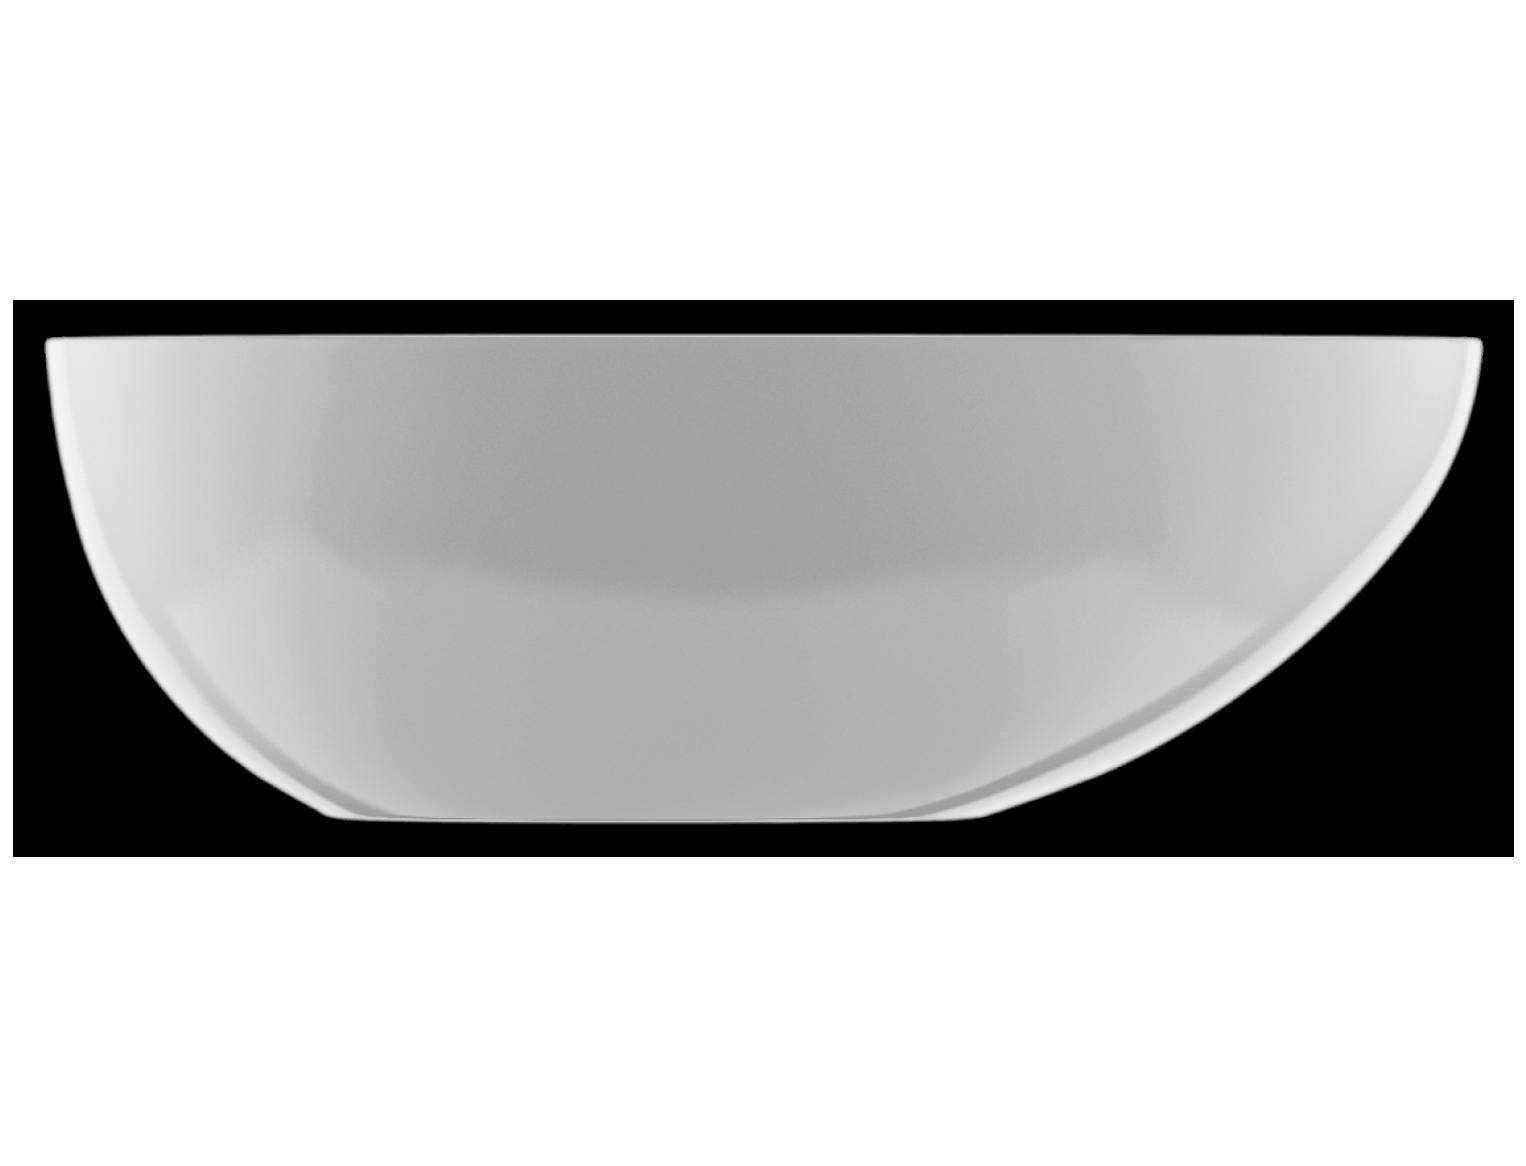 Bainultra Essencia Design freestanding air jet bathtub for your master bathroom